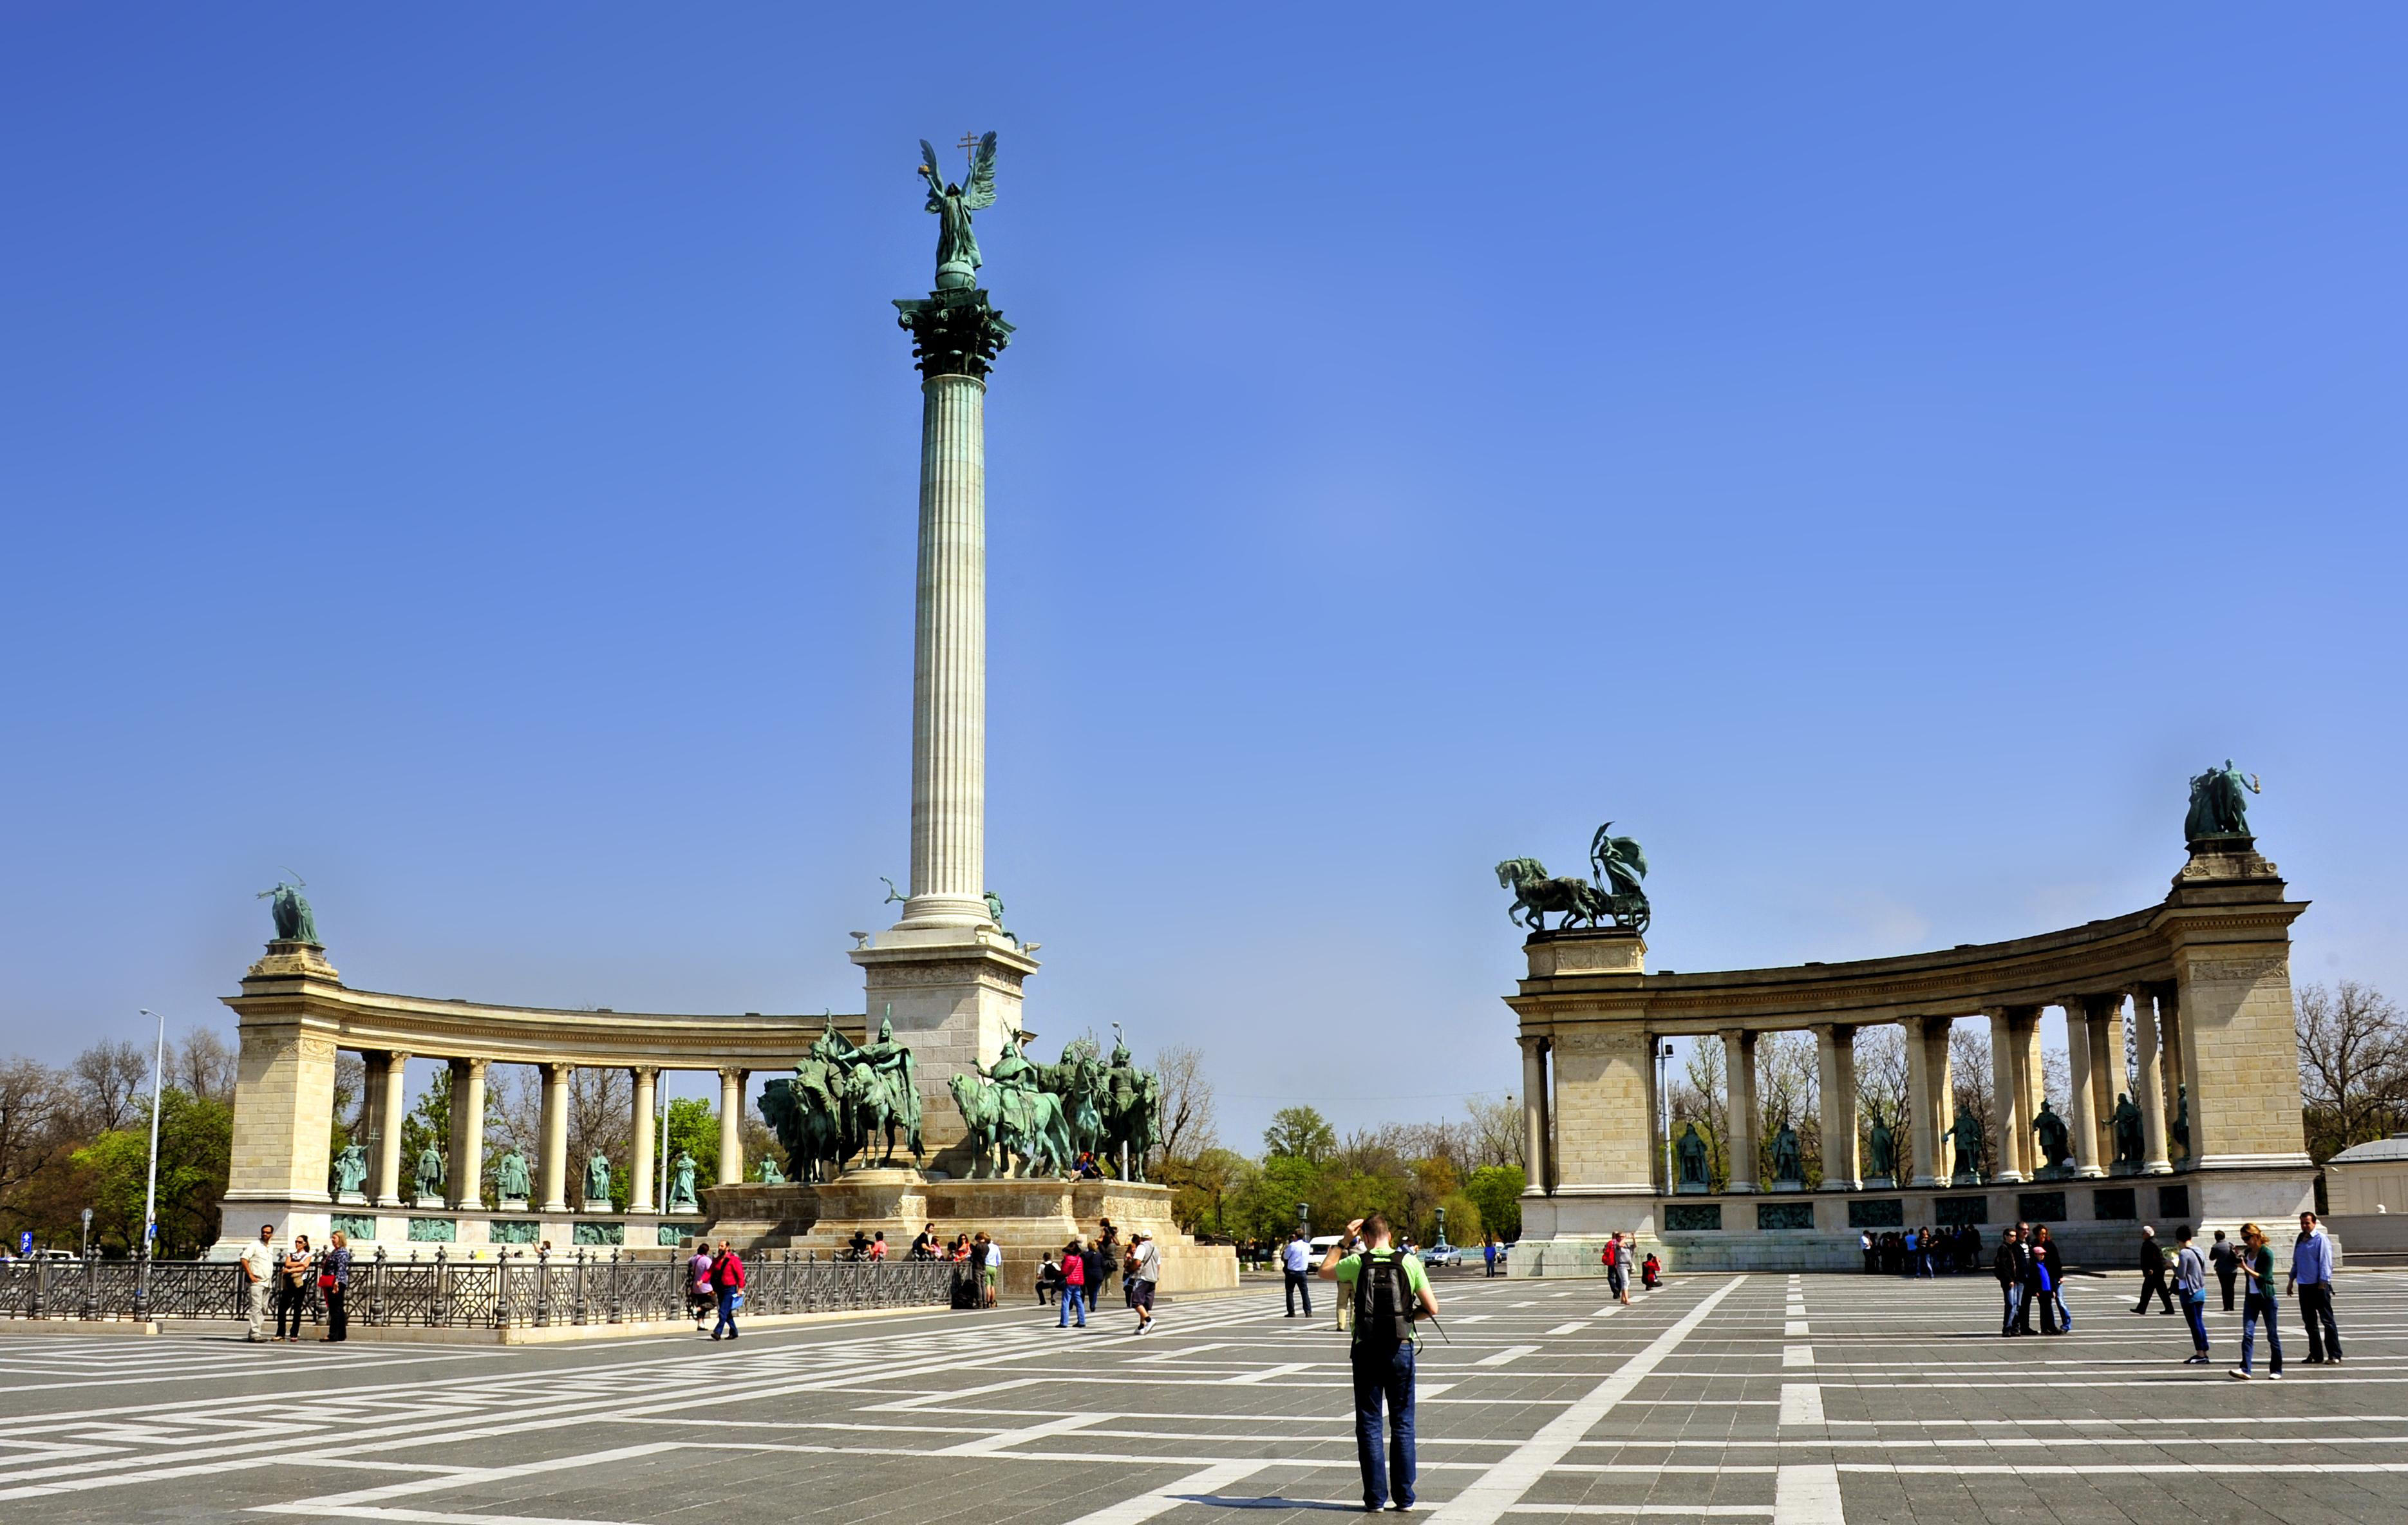 Budapest_Heroes' Square.jpg